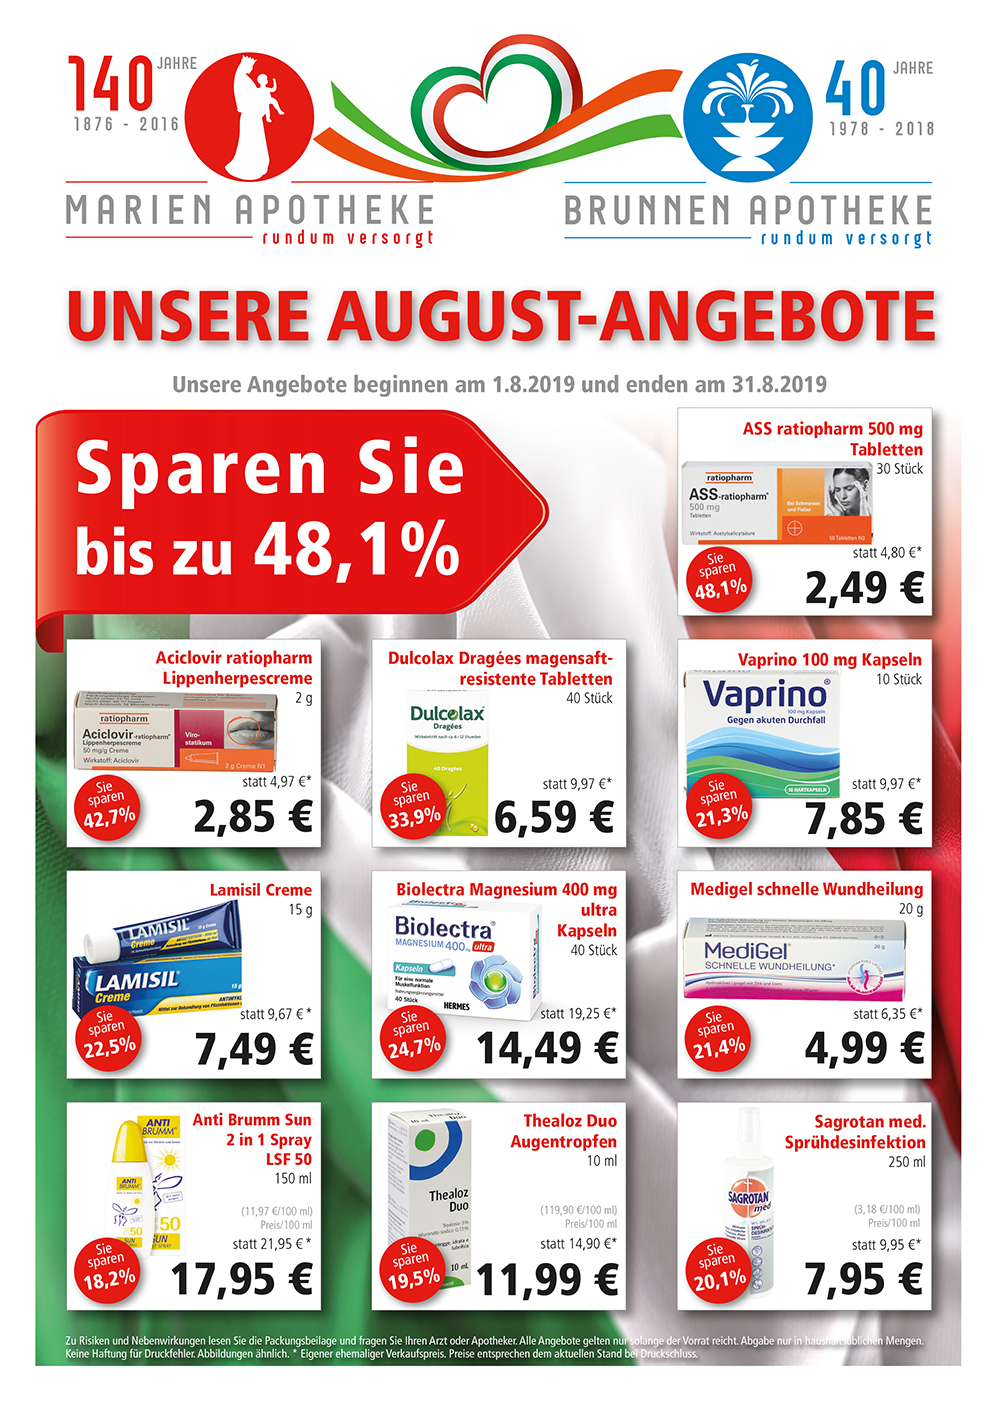 http://www.apotheken.de/fileadmin/clubarea/00000-Angebote/59387_brunnen_angebot_1.jpg